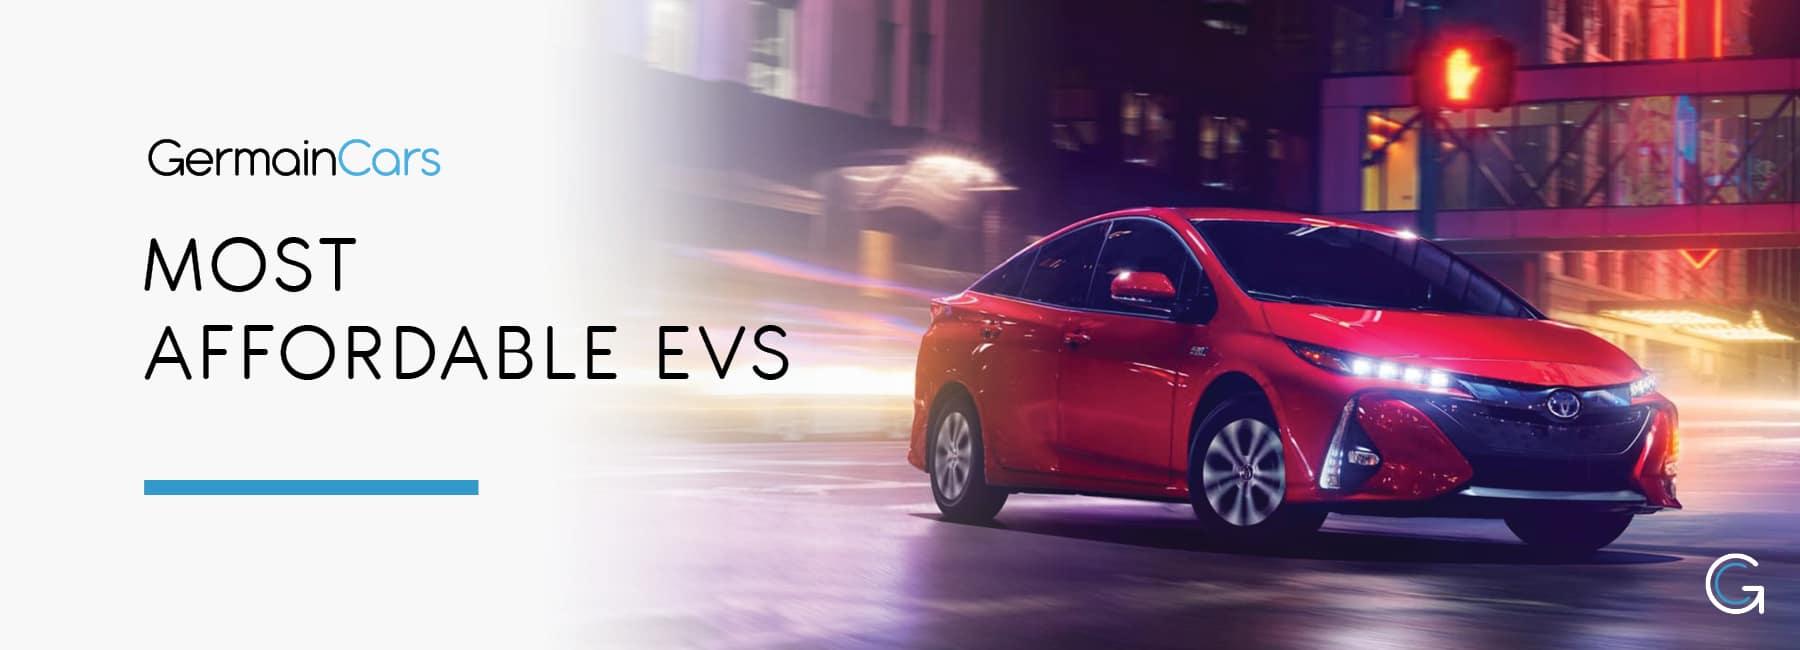 Most Affordable EVs